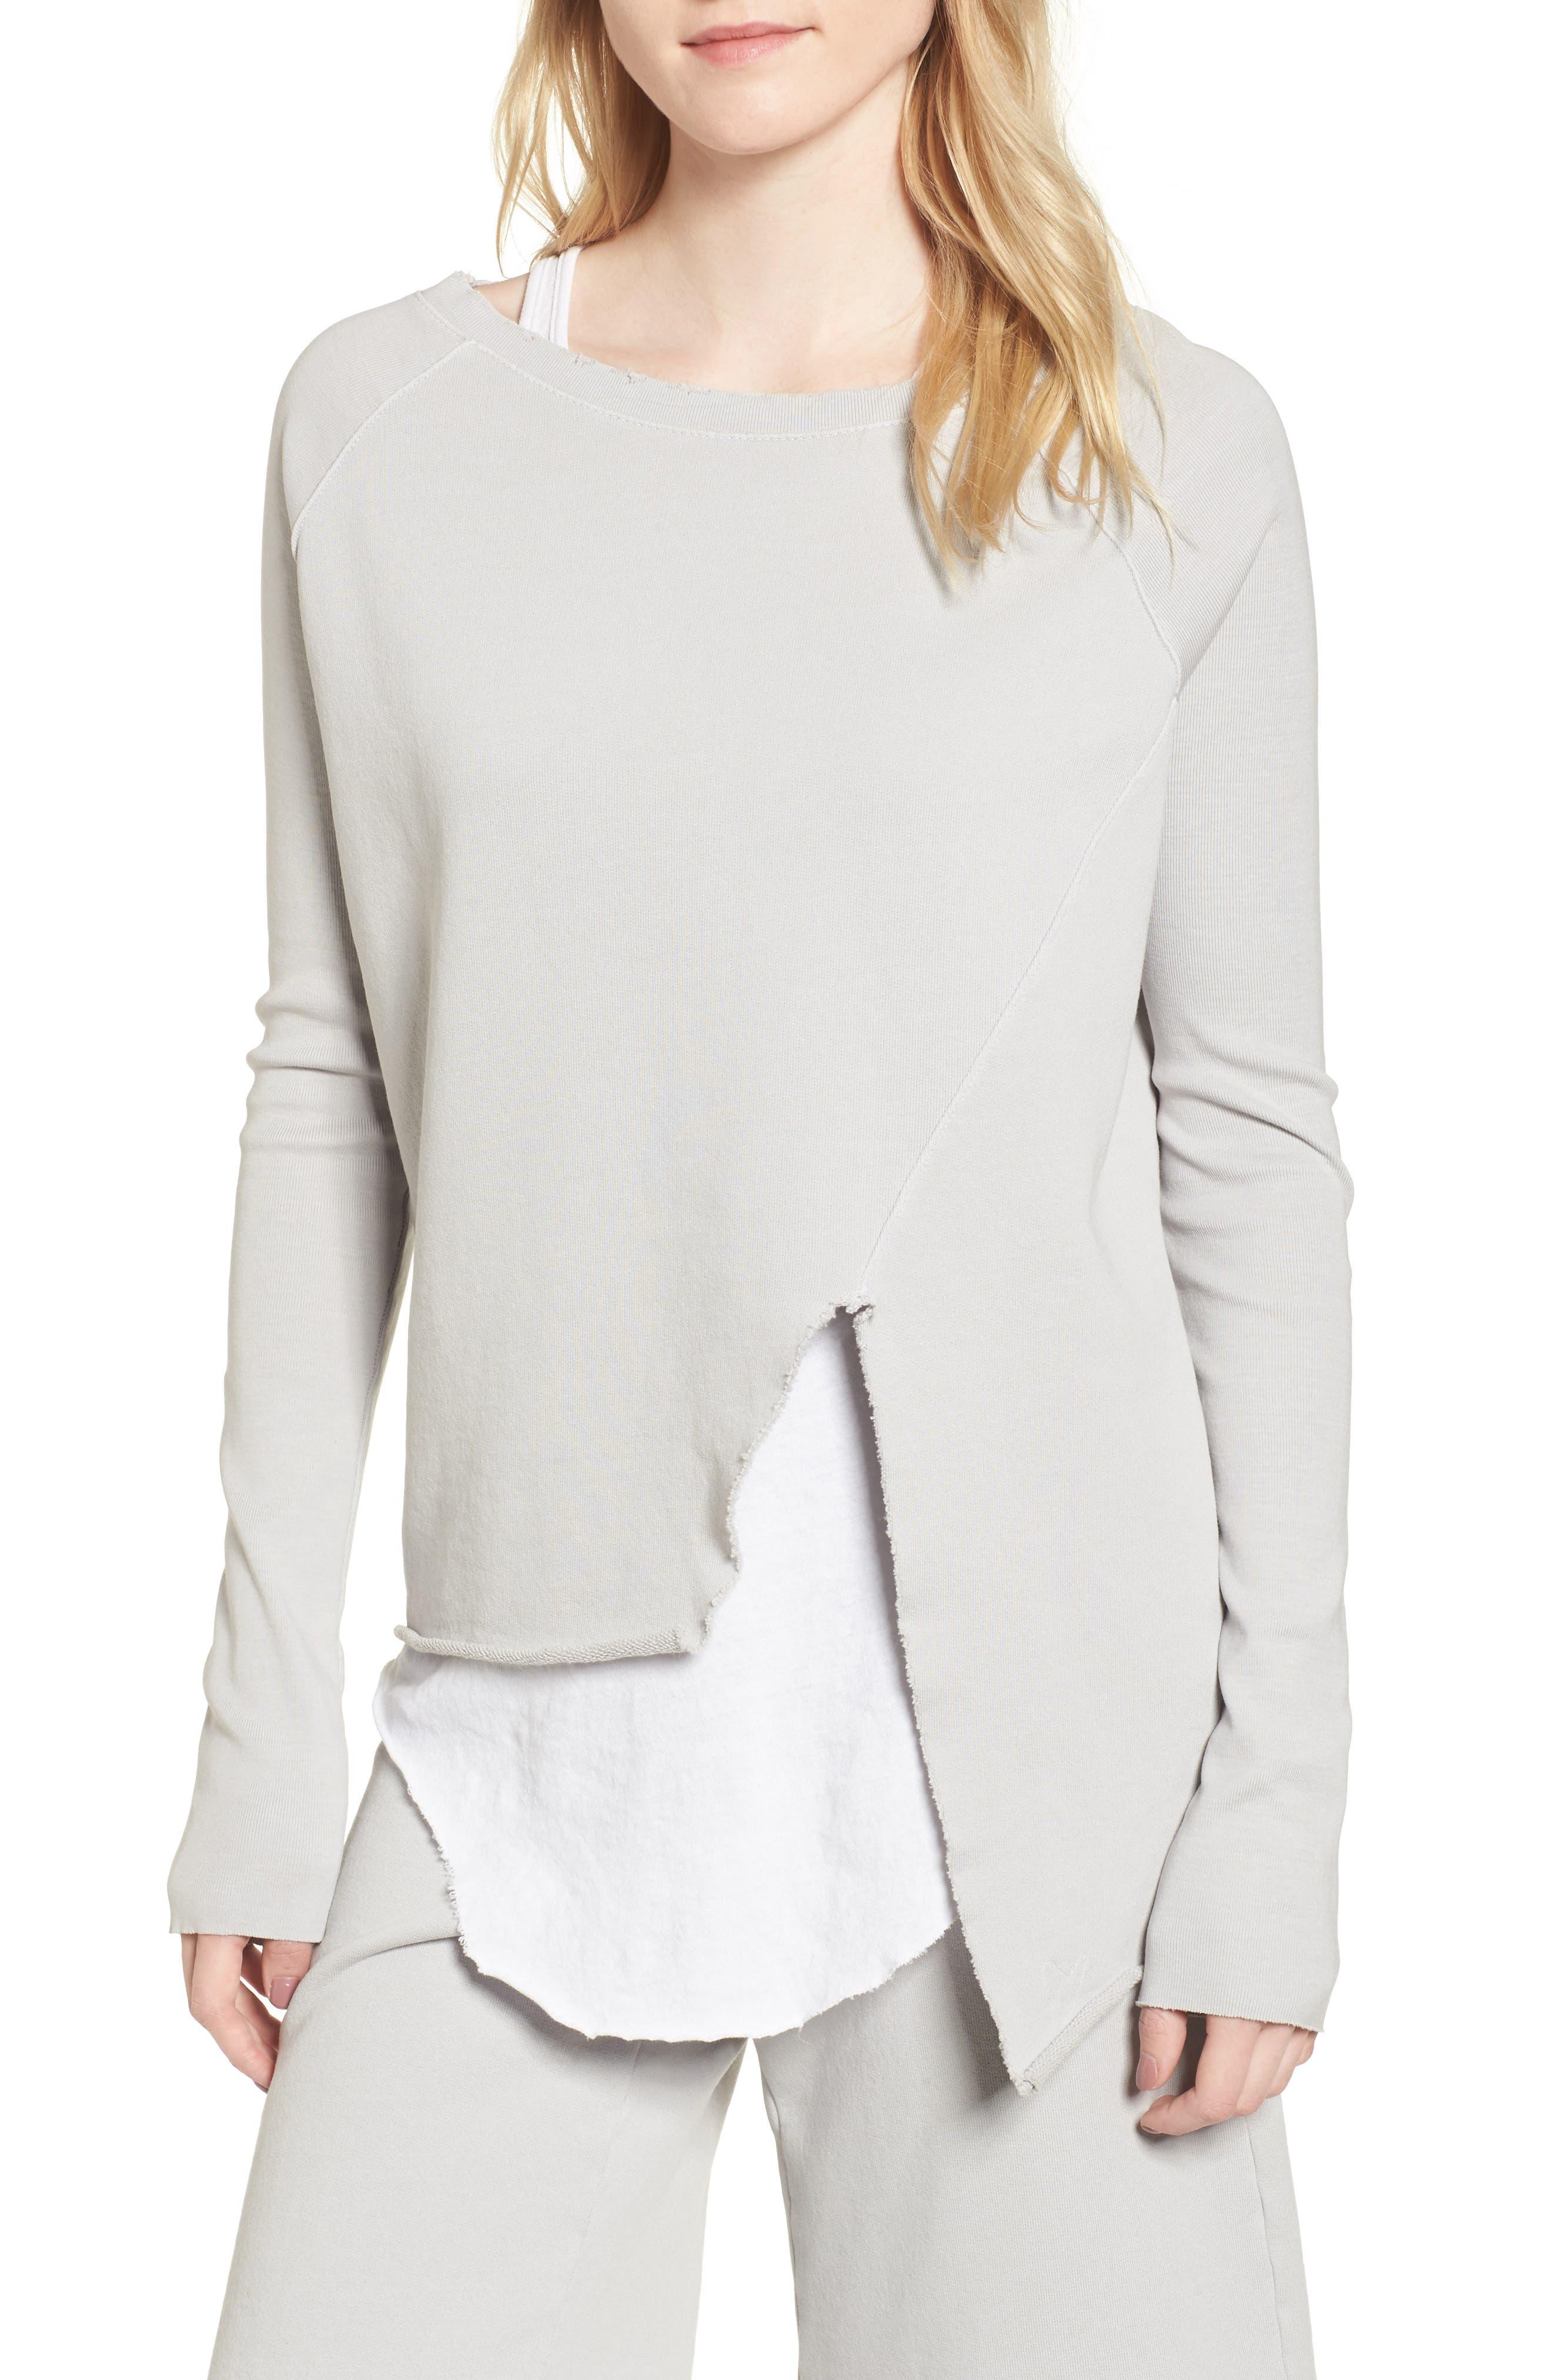 Alternate Image 1 Selected - Frank & Eileen Tee Lab Asymmetric Sweatshirt